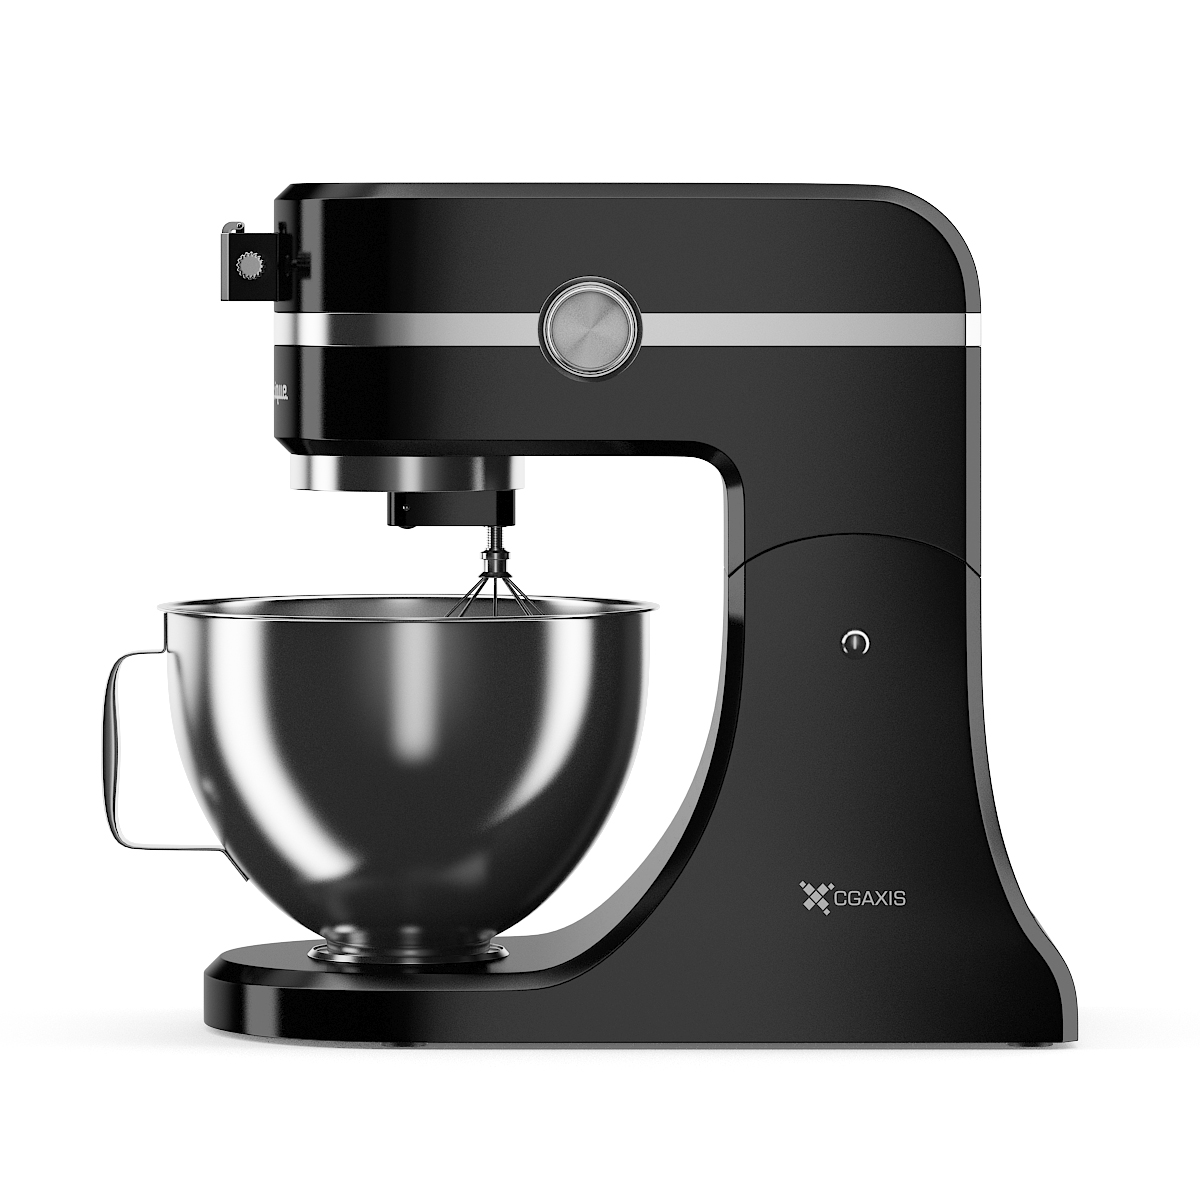 David Jones Kitchen Appliances Cgaxis Models Volume 61 3d Kitchen Appliances Iii Cg Daily News